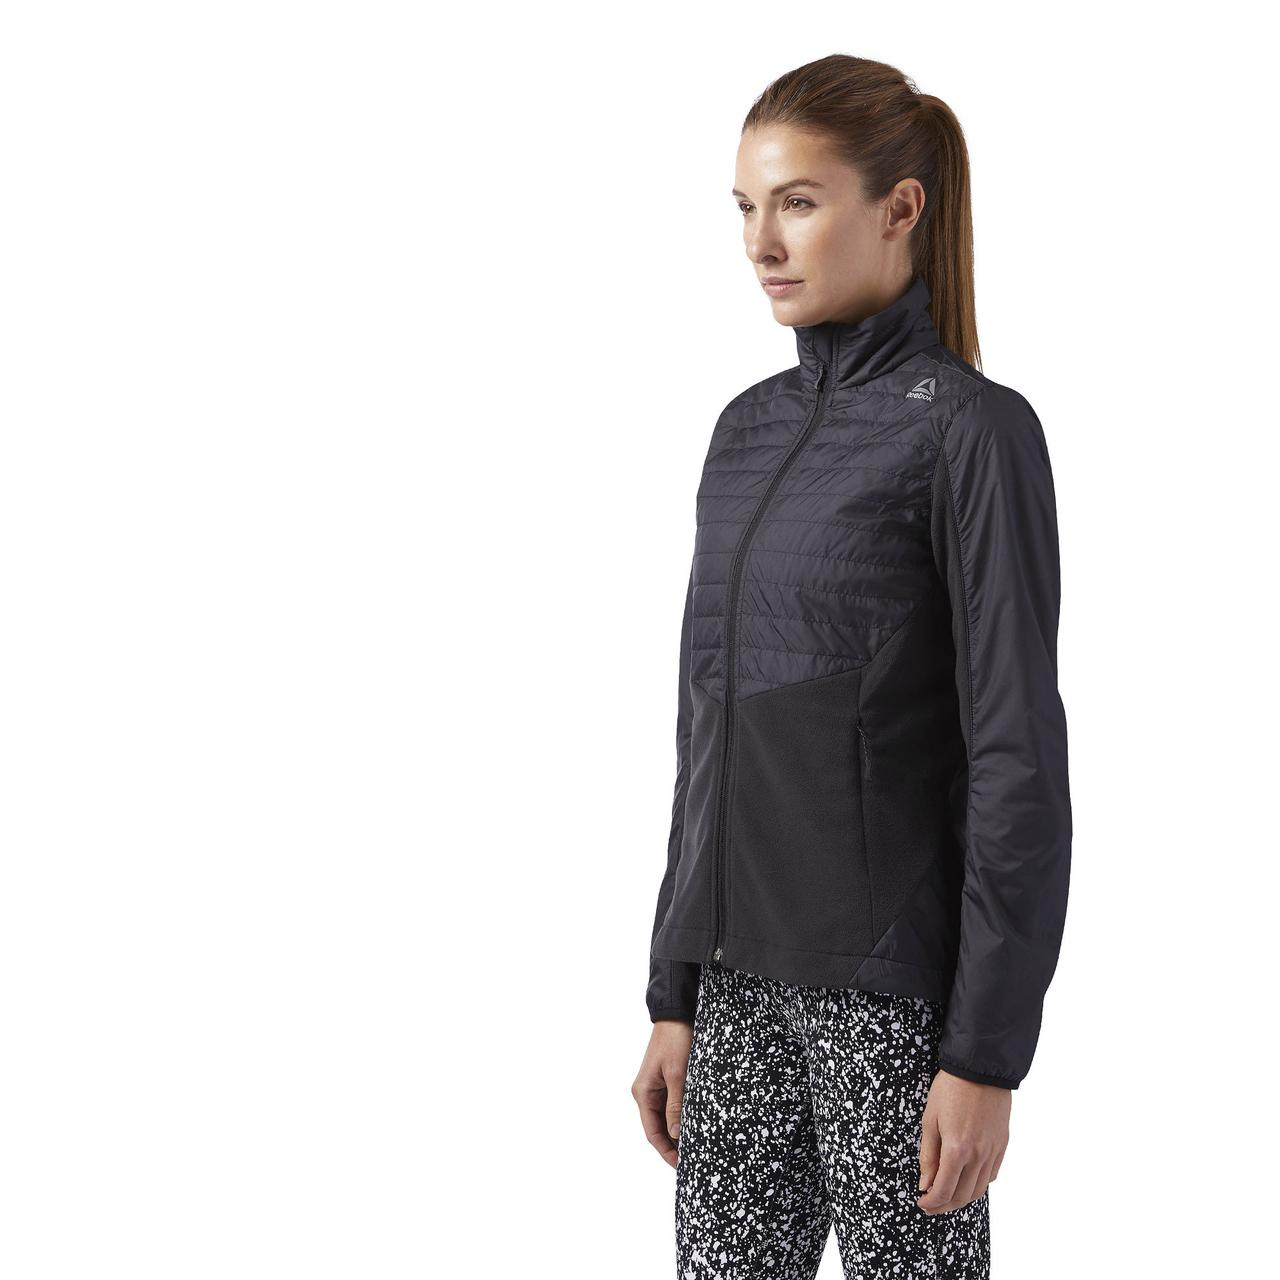 Женская куртка Reebok Outdoor Combed Fleece (Артикул: BR0520)